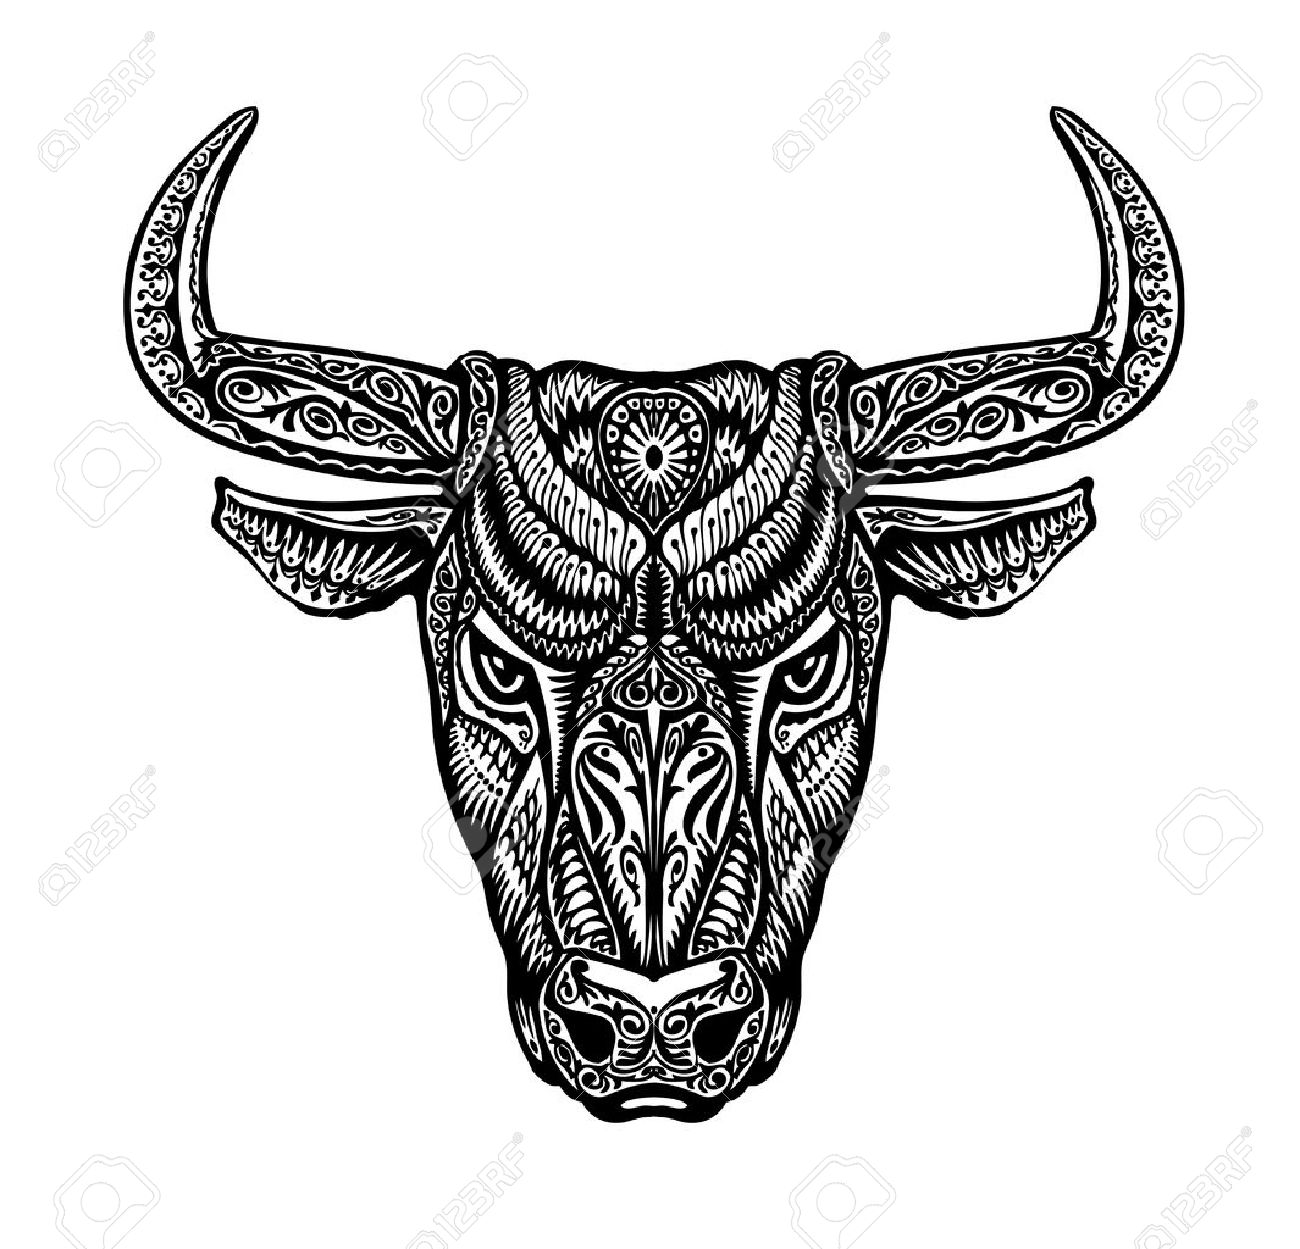 Bull Taurus Painted Tribal Ethnic Ornament Vector Illustration Stock